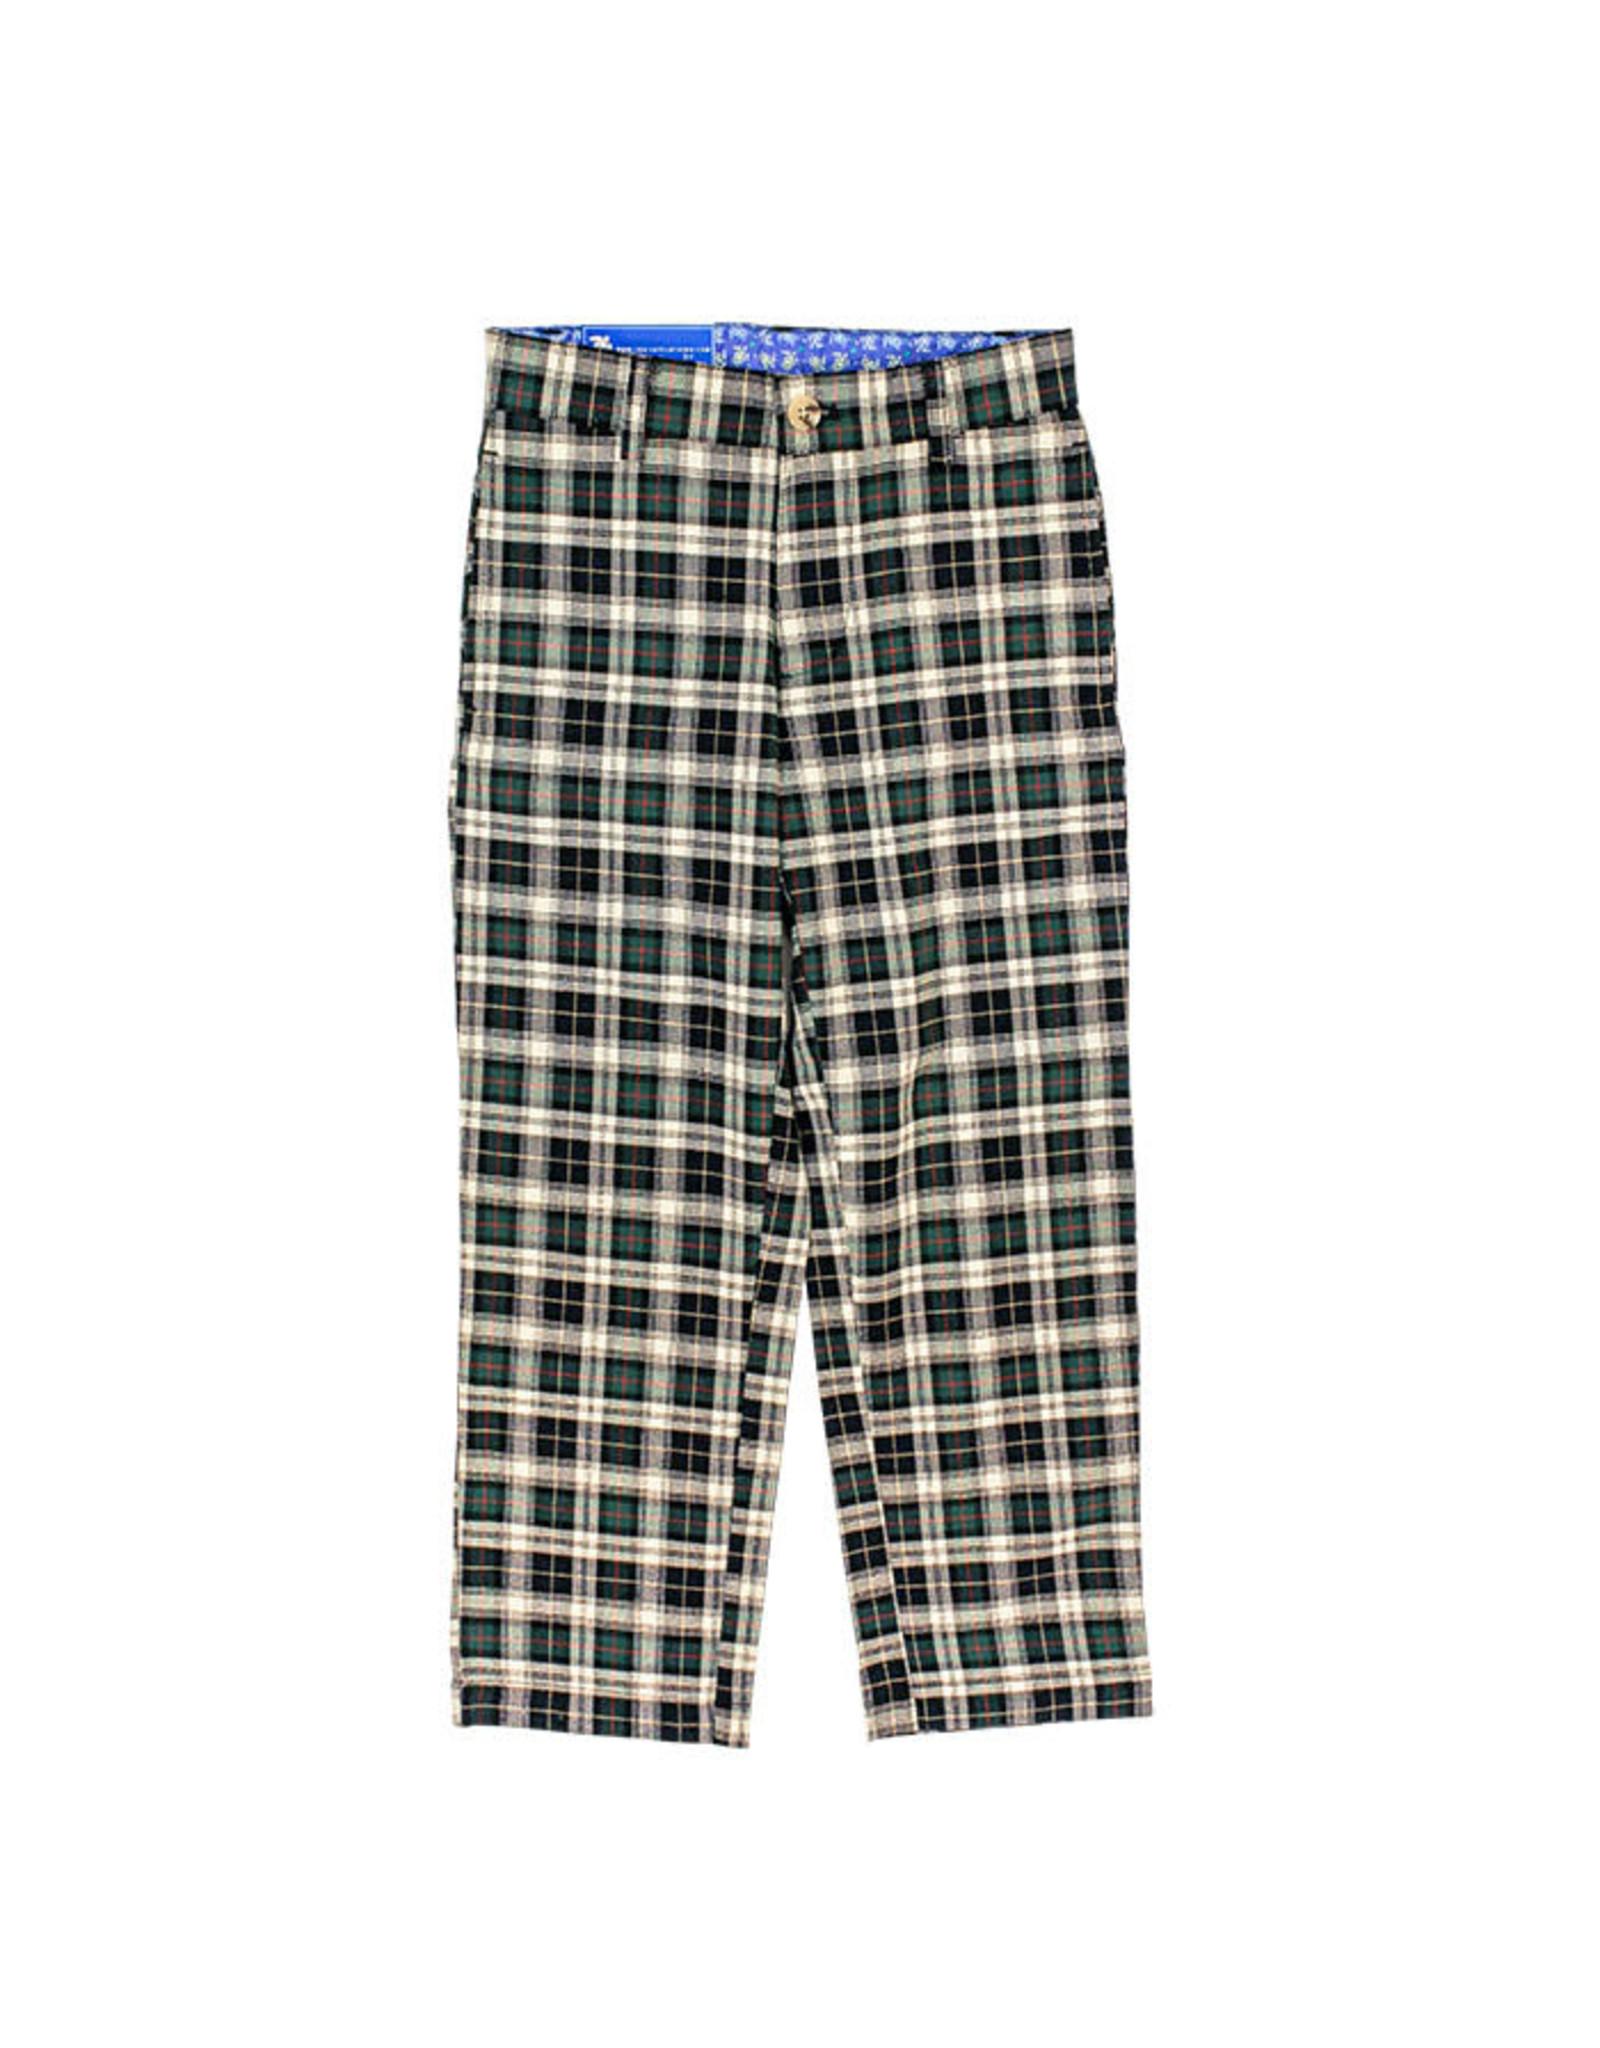 J Bailey Hunter Plaid Pants